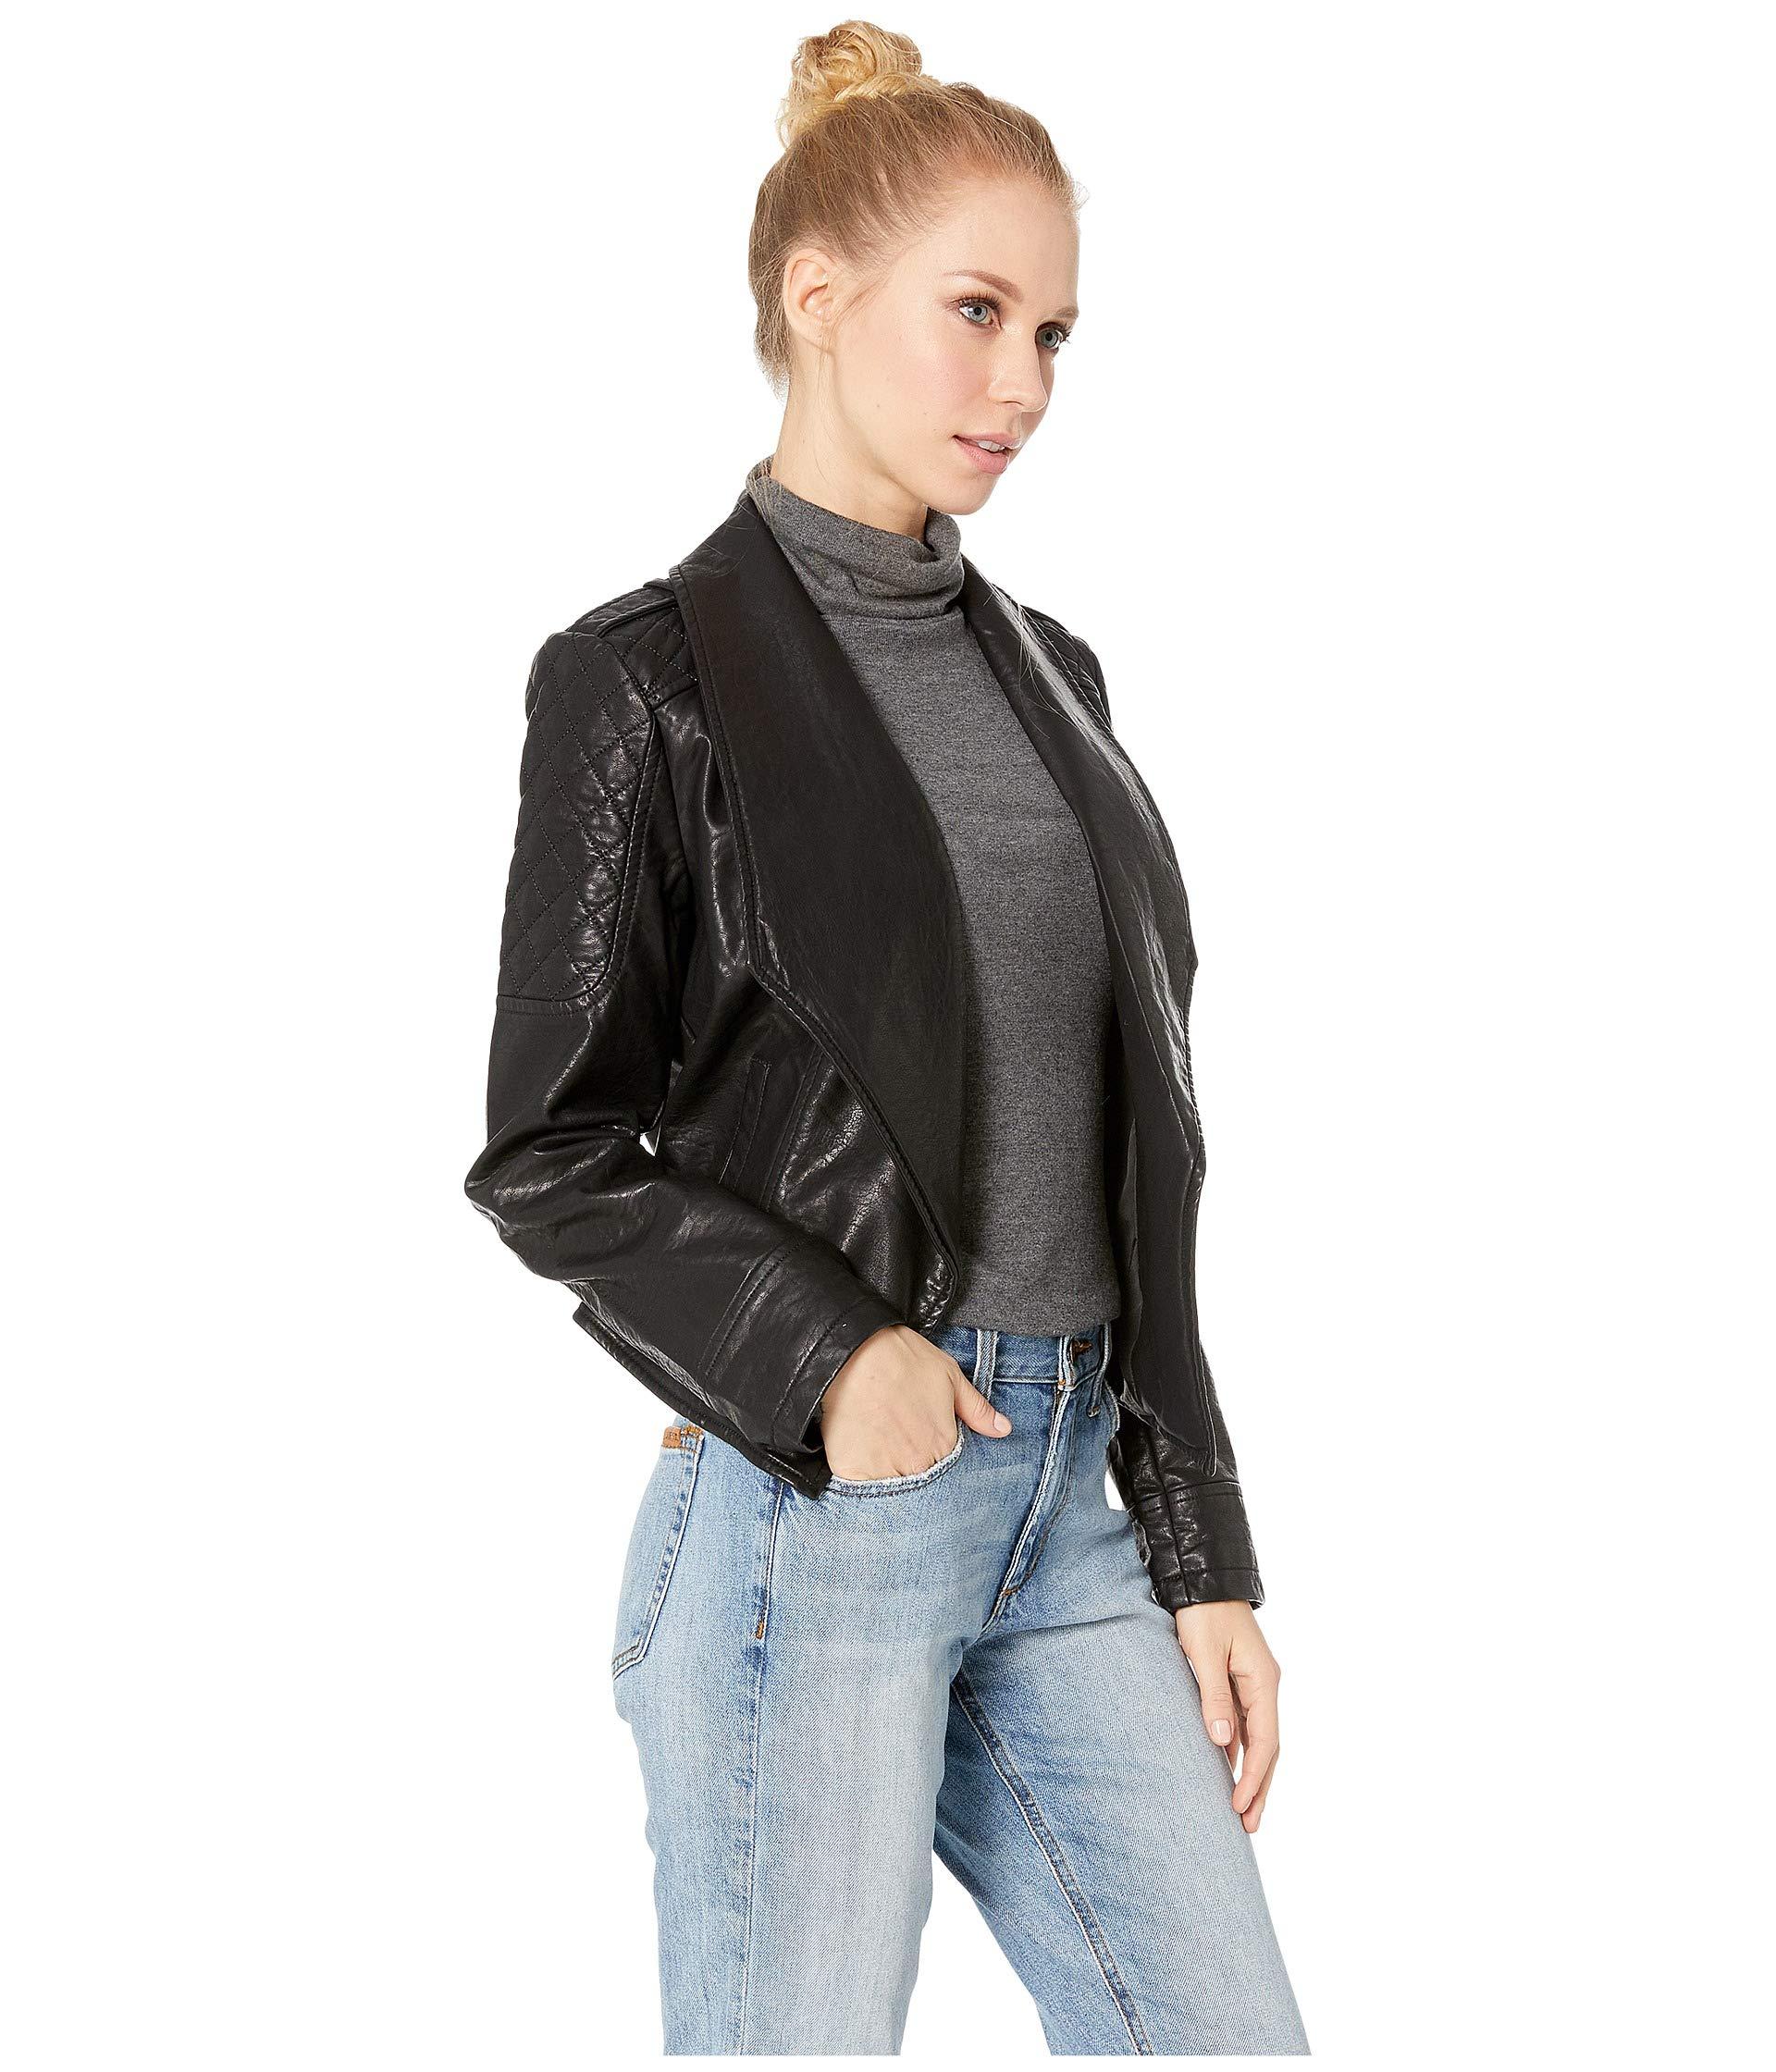 Black The 101 Drape Jack Vegan Dakota By Rippled Jacket Front Take Leather Bb xqwxIH6a